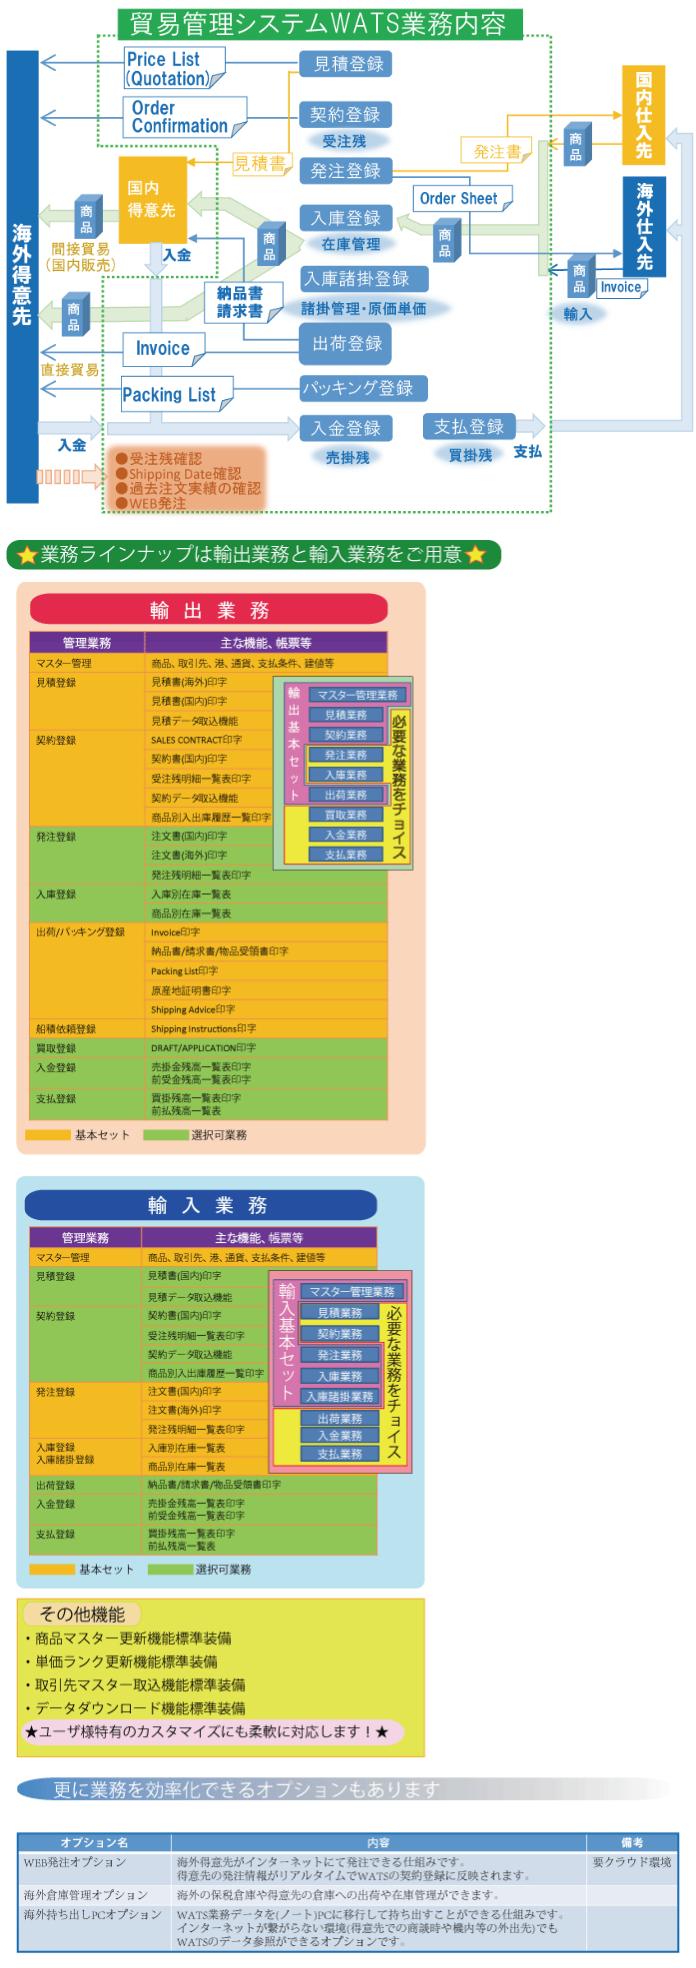 WATS製品詳細2